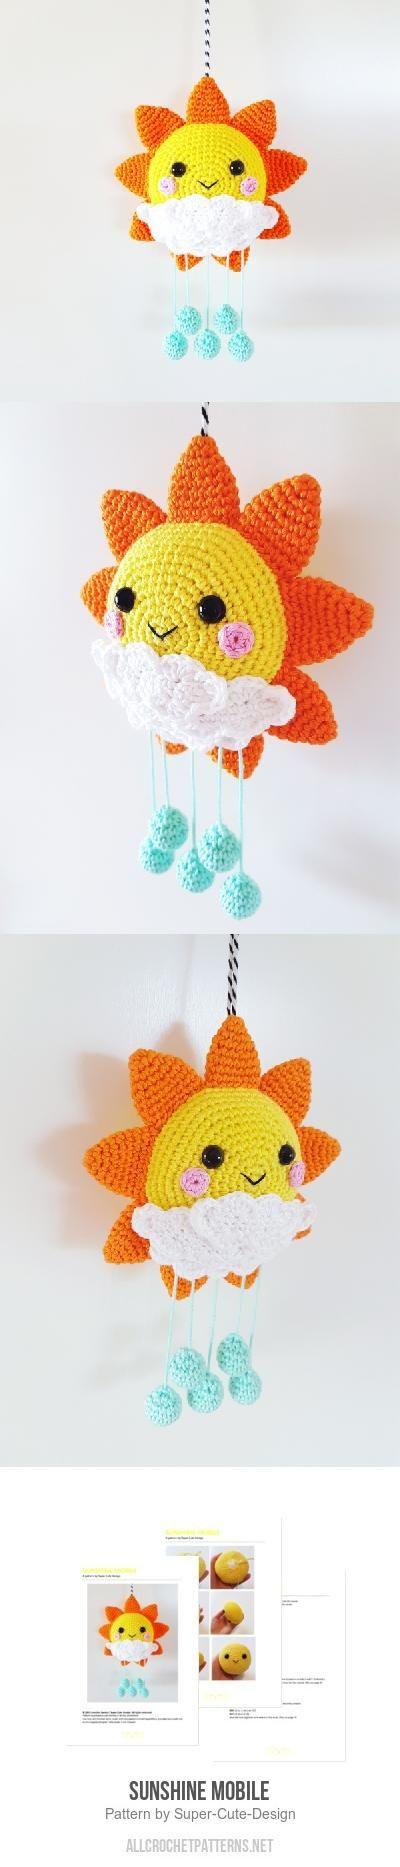 Sunshine Mobile crochet pattern by Super Cute Design   Tejido ...